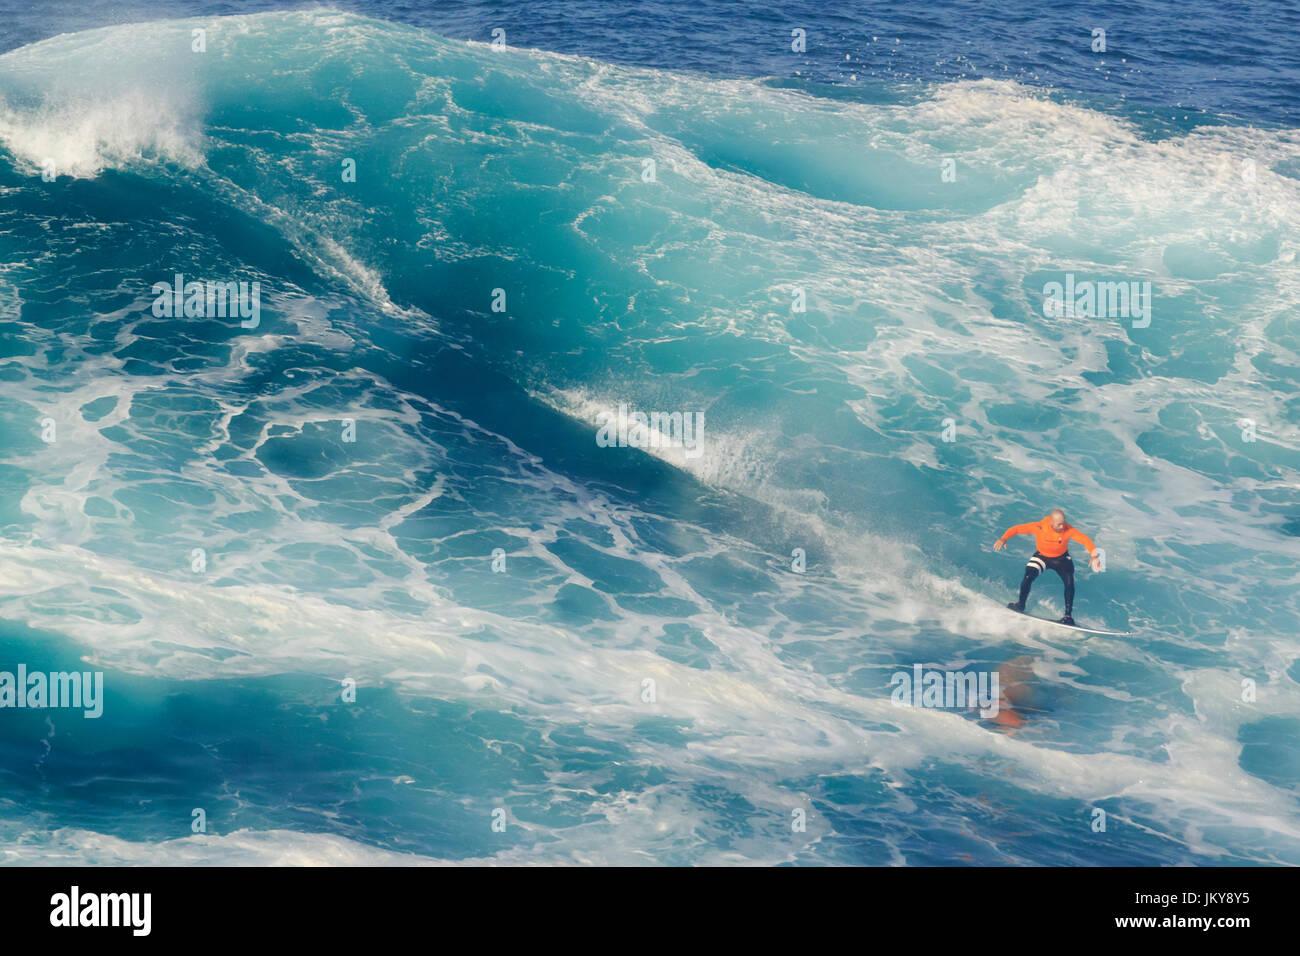 Big wave surfing event. The biggest surfing waves in the world, at Praia do Norte beach, Nazare, Portugal, popularized by Garrett MacNamara Stock Photo